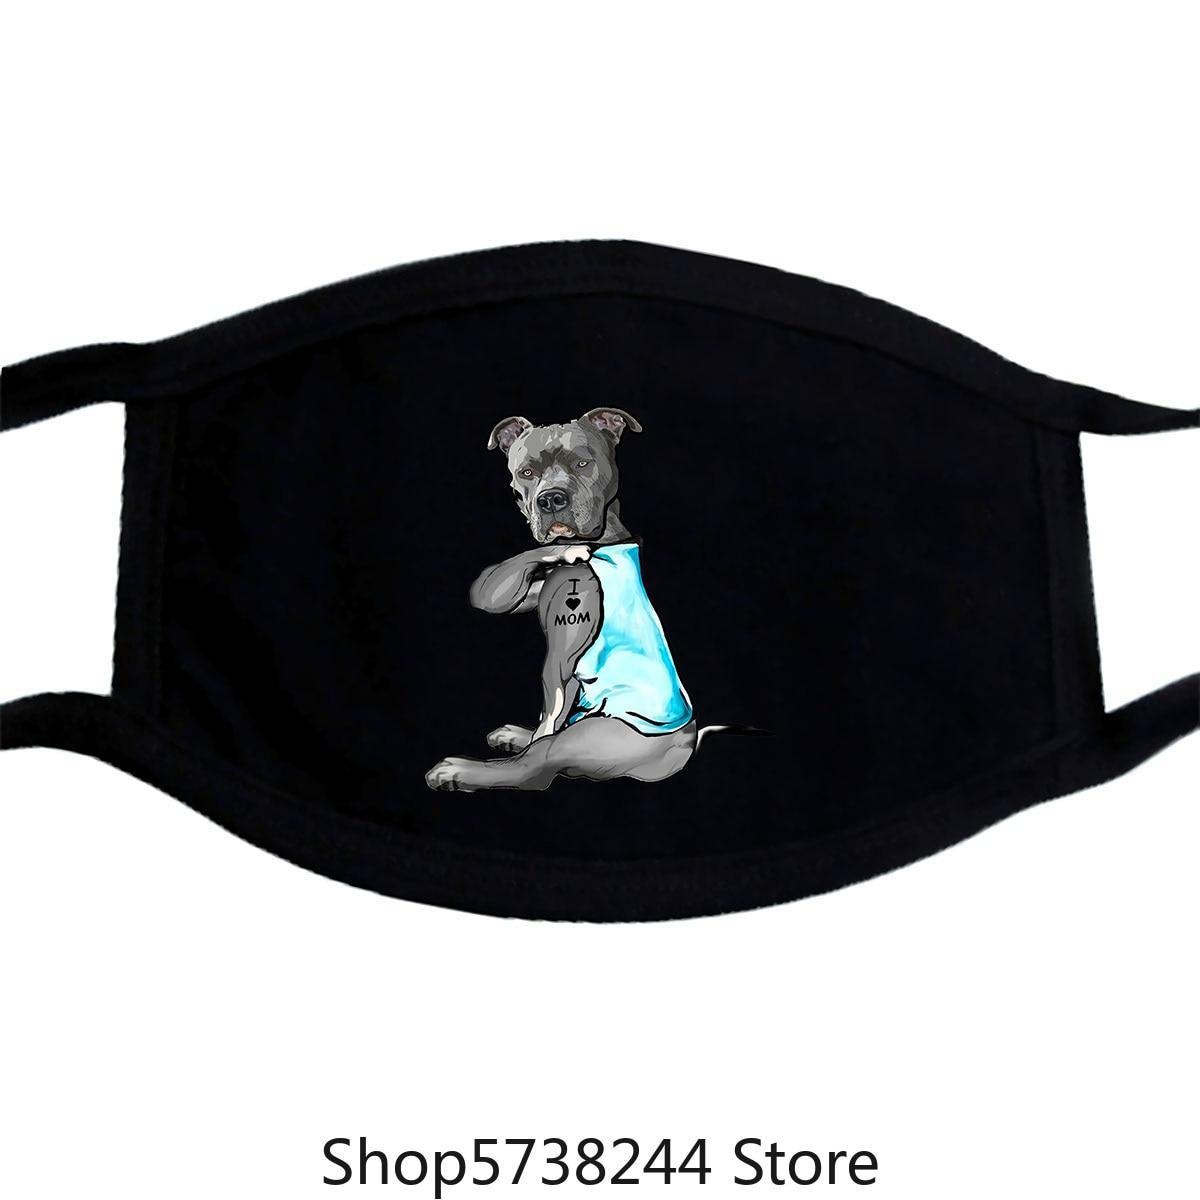 Just A Dog Lover Mask Colorful Pattern Washable Reusable Mask For Unisex Black